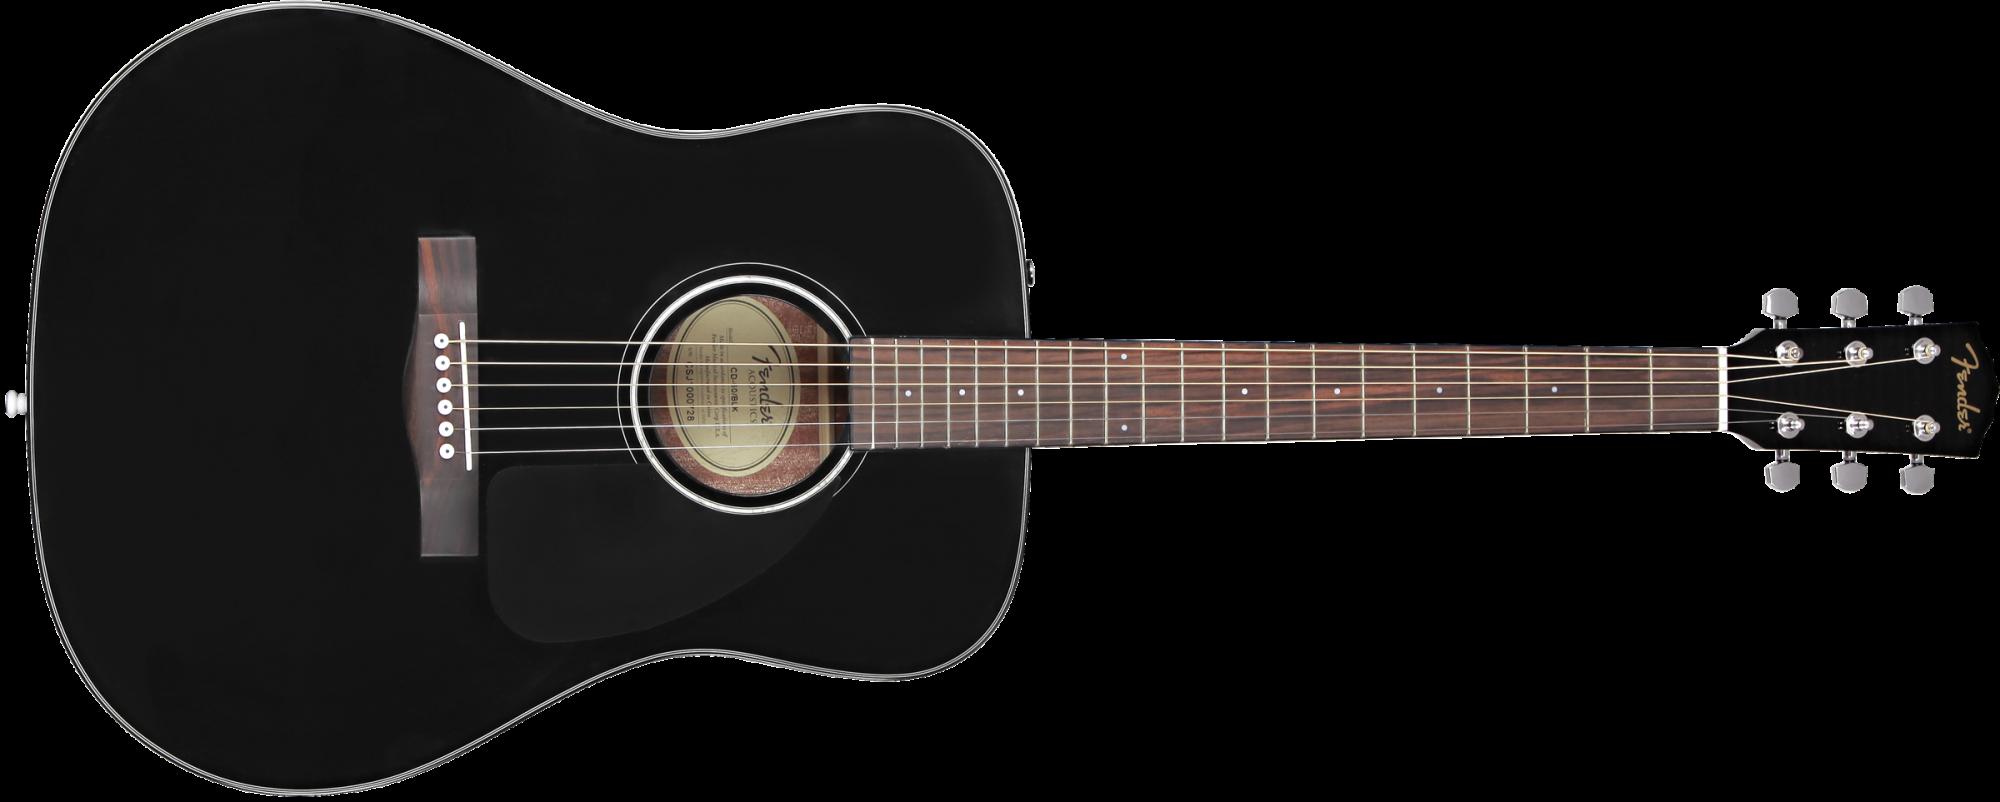 Fender CD-60 Dreadnought V3 w/Hardshell Case, Walnut Fingerboard, Black